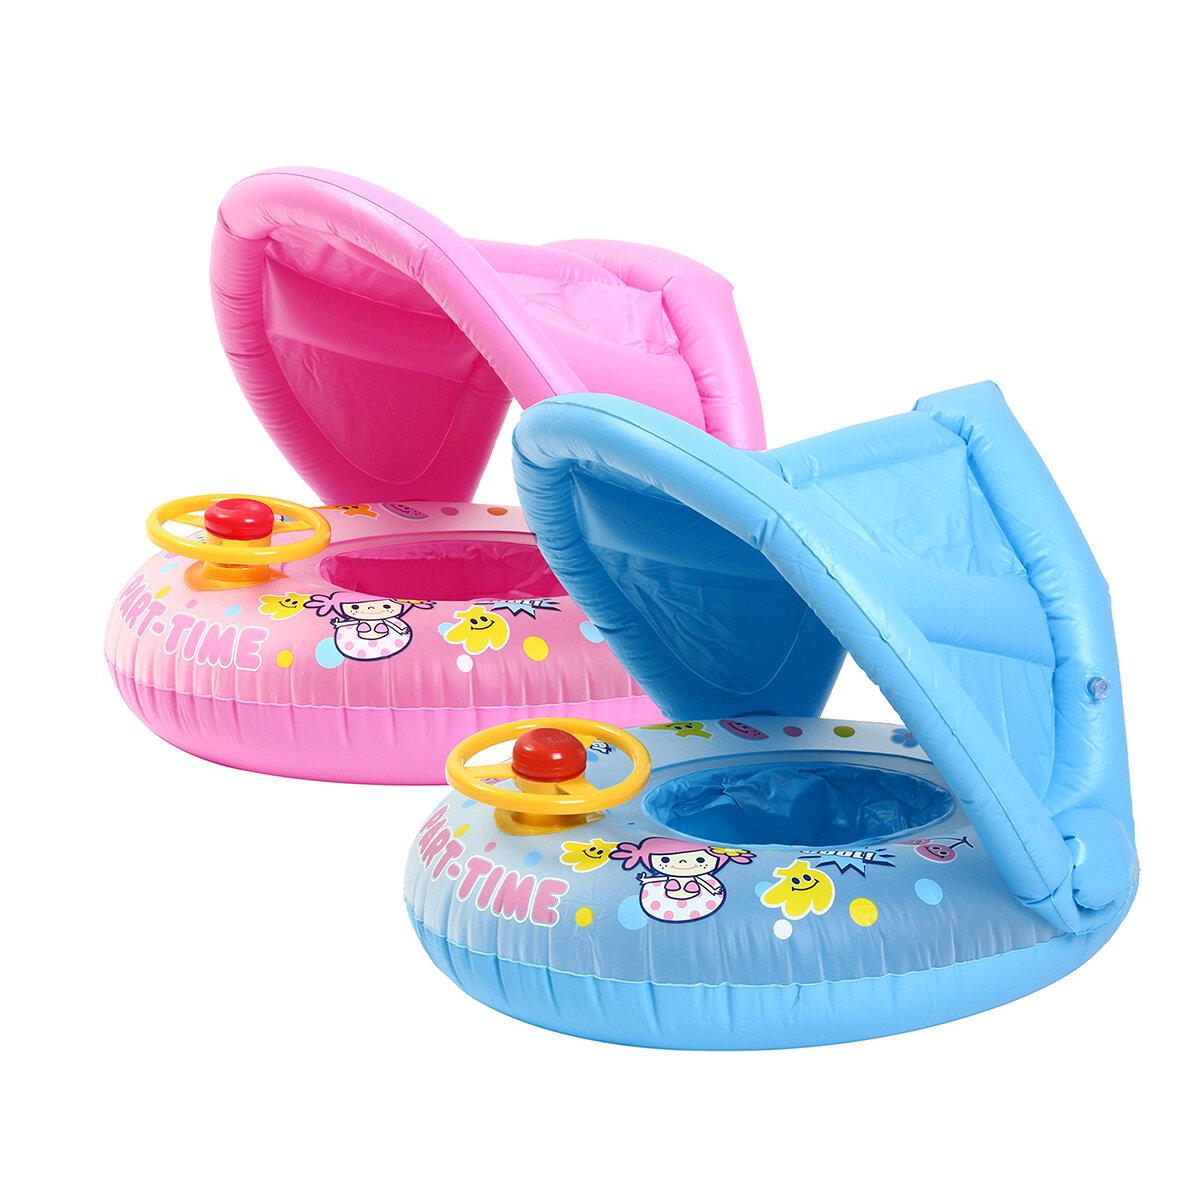 76d69195b Inflatable Sunshade Baby Kids Water Float Seat Boat Swimming Ring Pool Fun